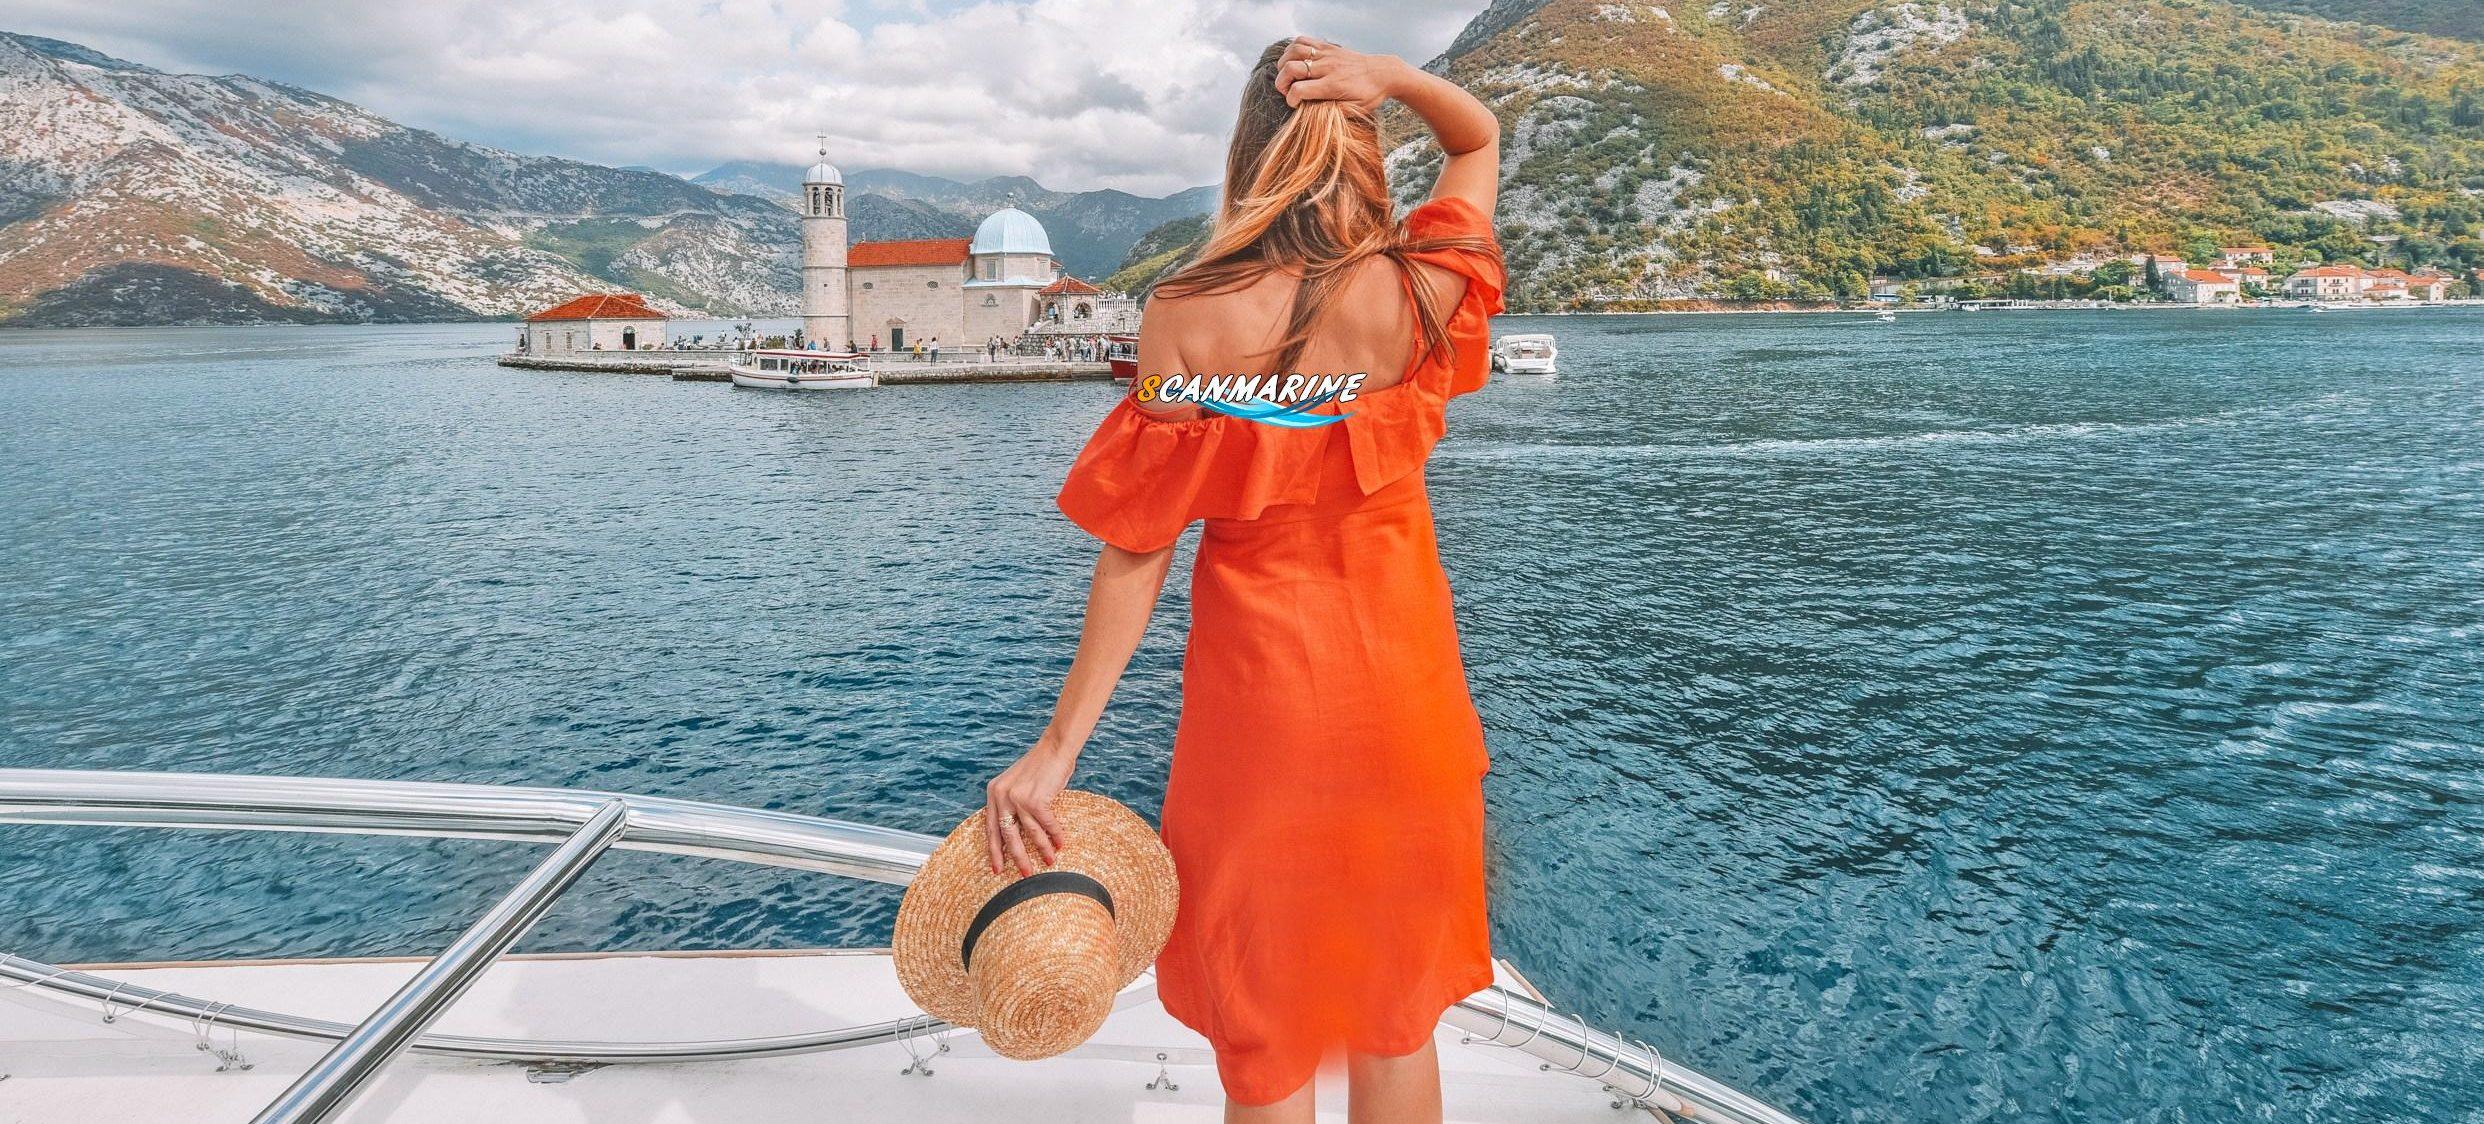 Морские прогулки под парусом на яхте в Черном море